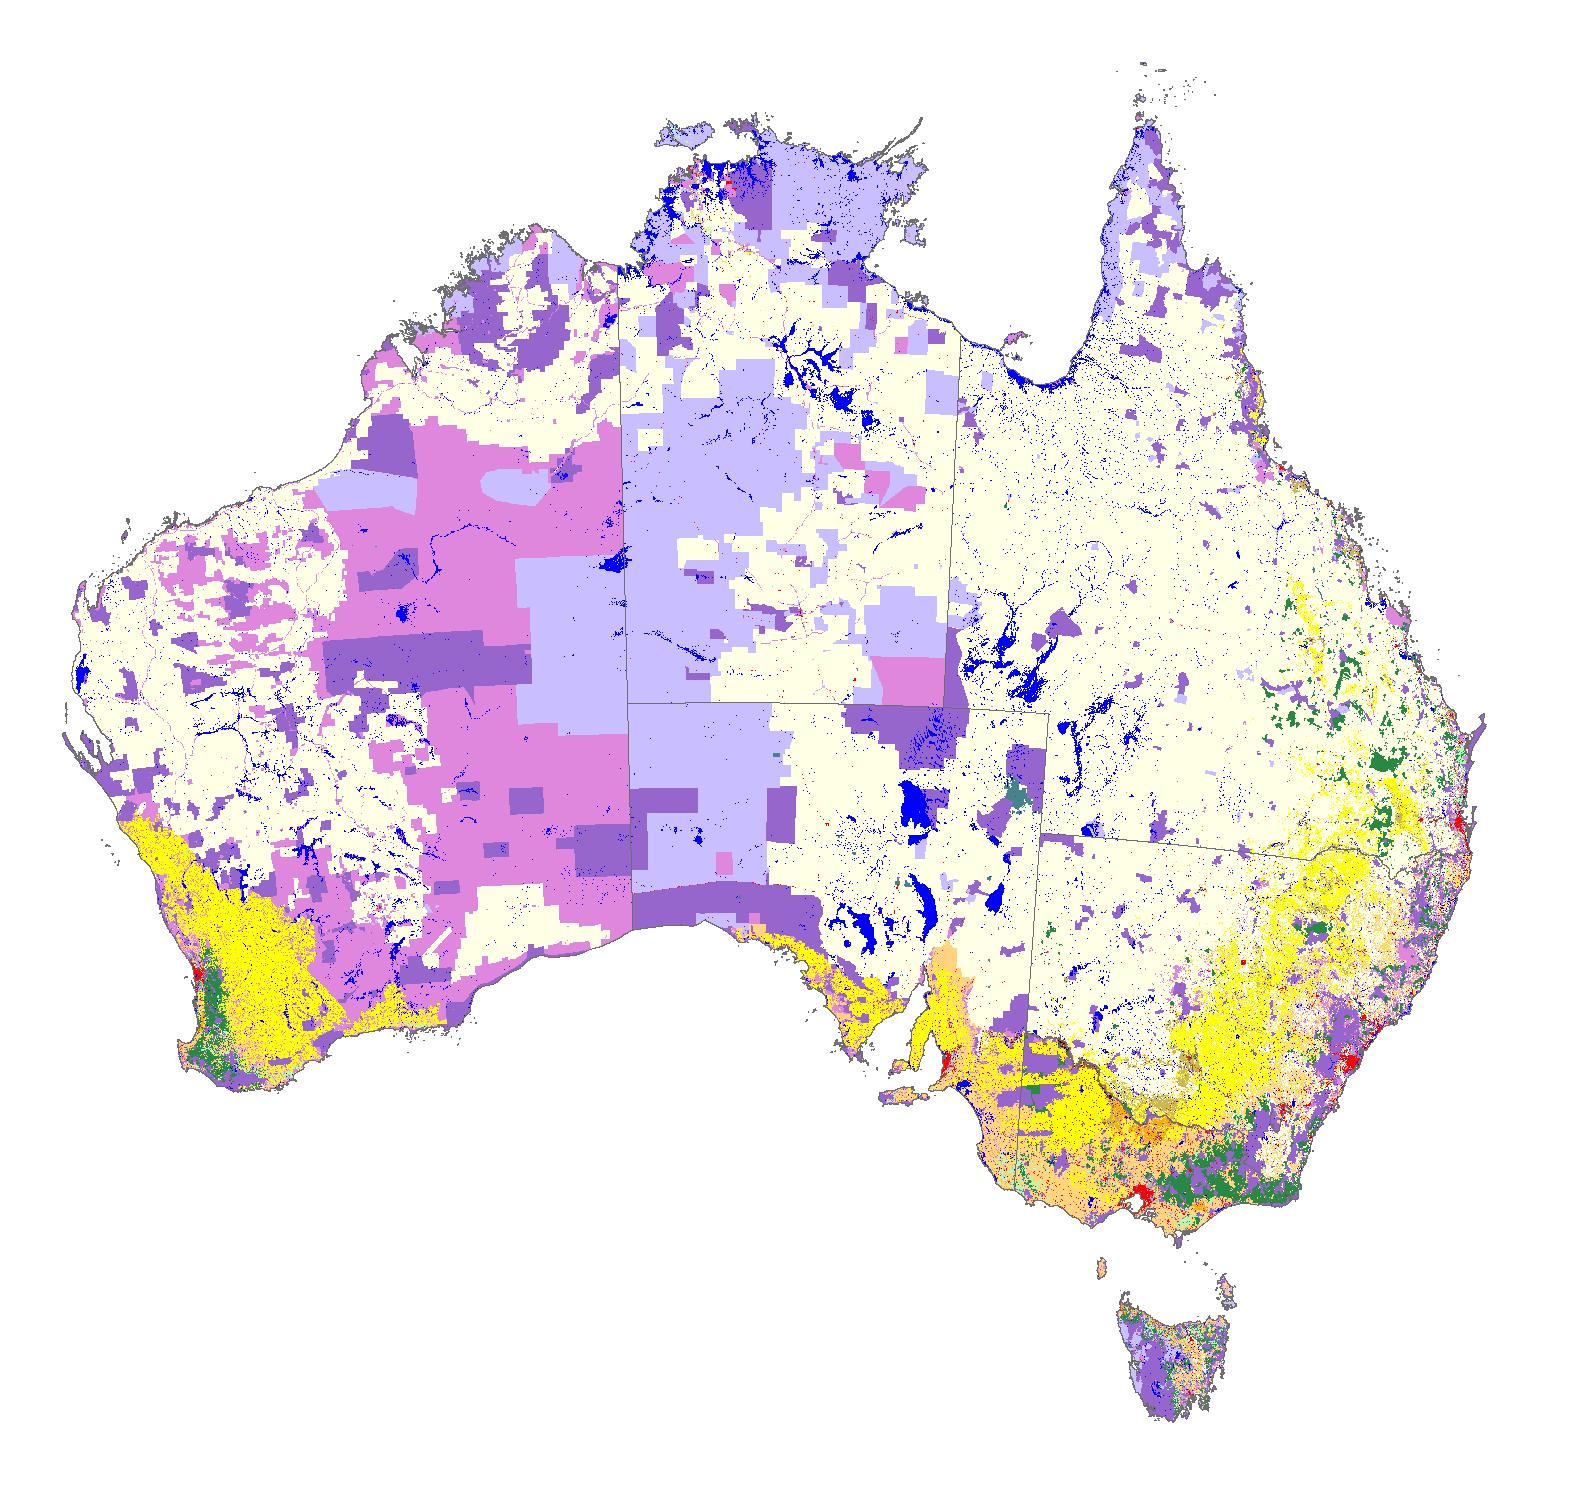 Australia Png (75+ images).